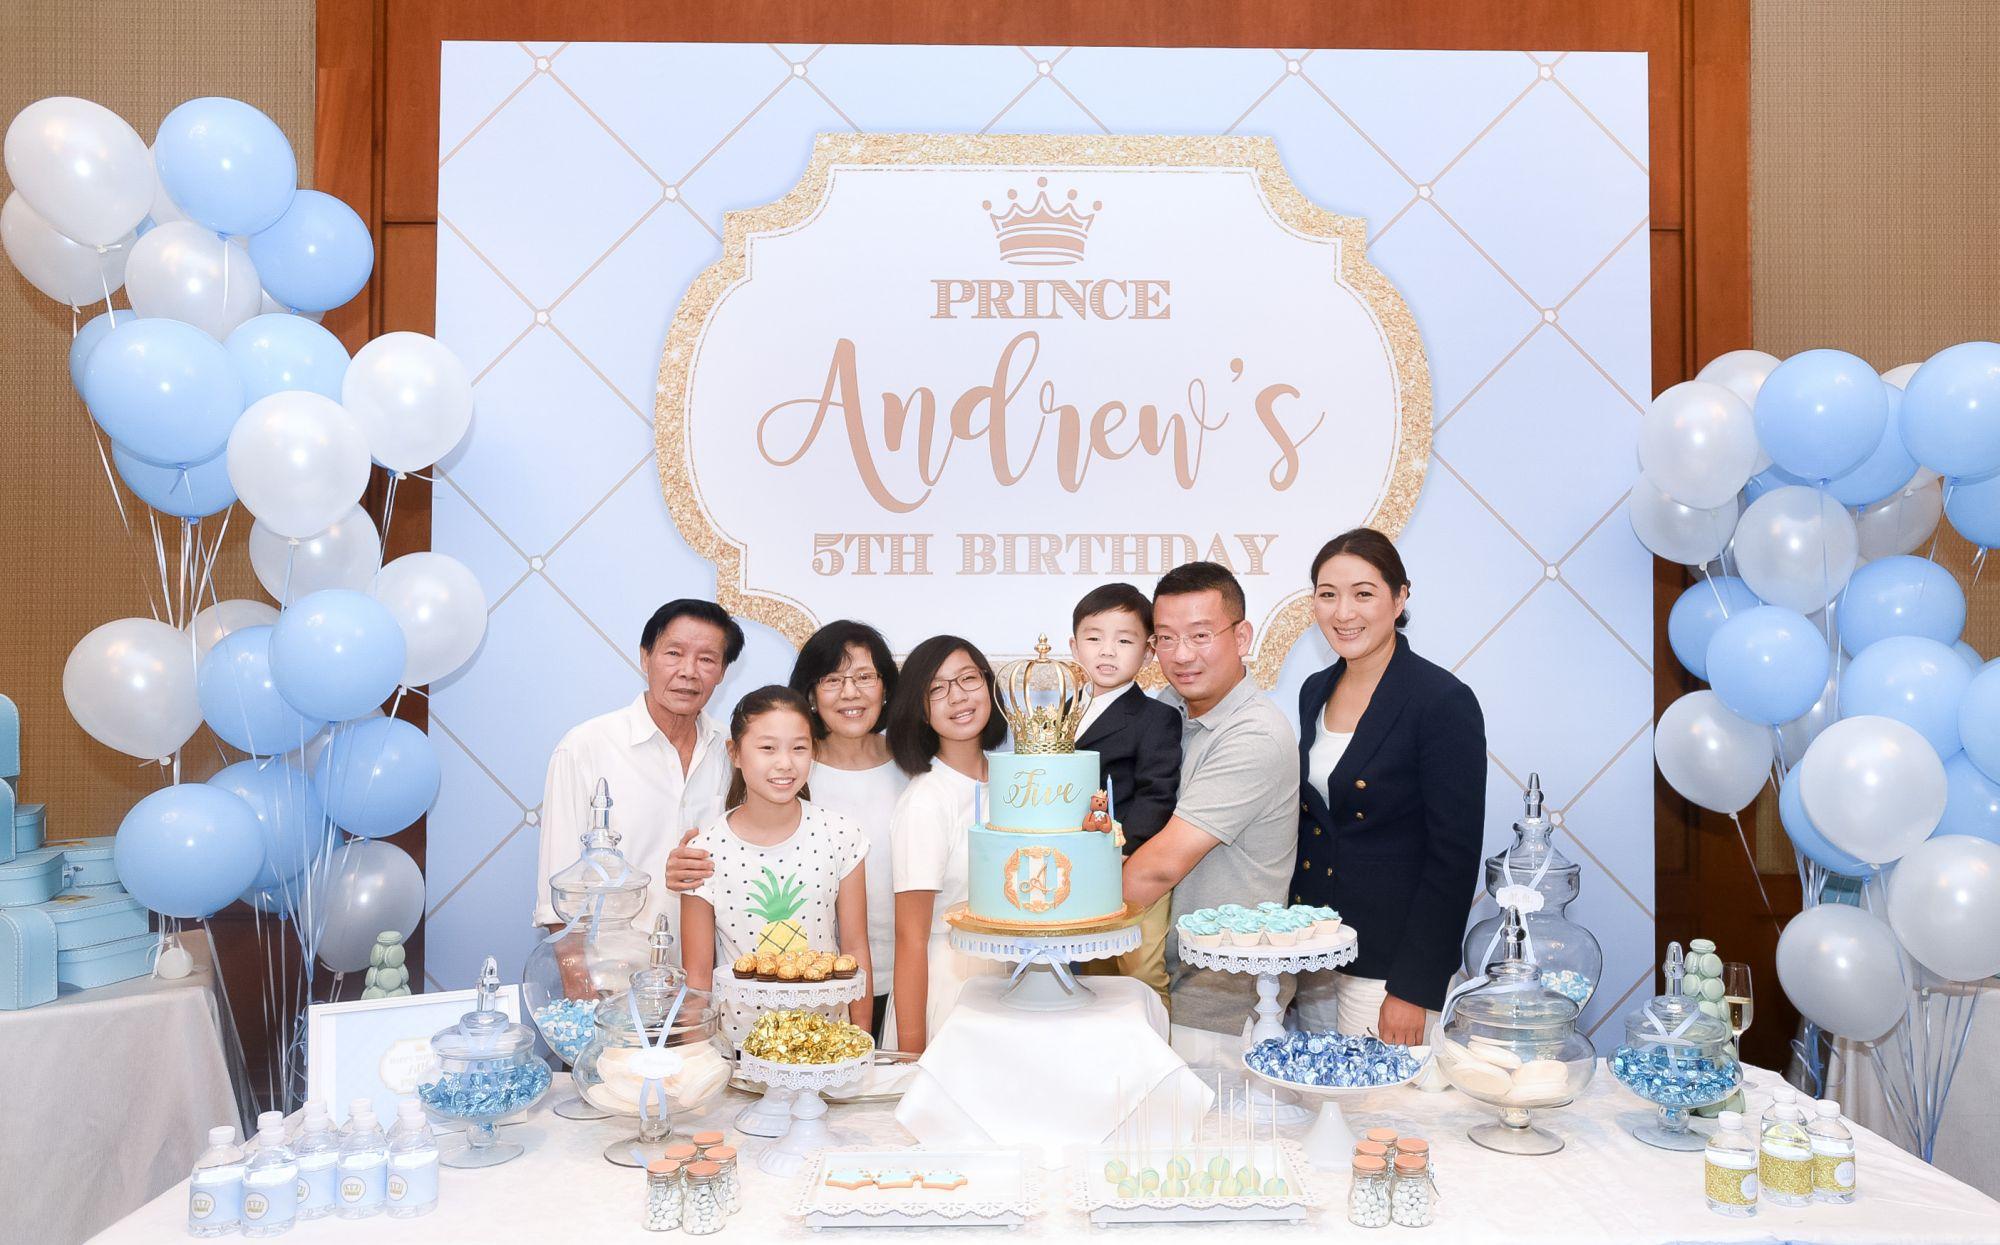 Chua Cheak Song, Charlotte Chua, Alice Chua, Melissa Chua, Andrew Chua, Edwin Chua, Nana Au-Chua